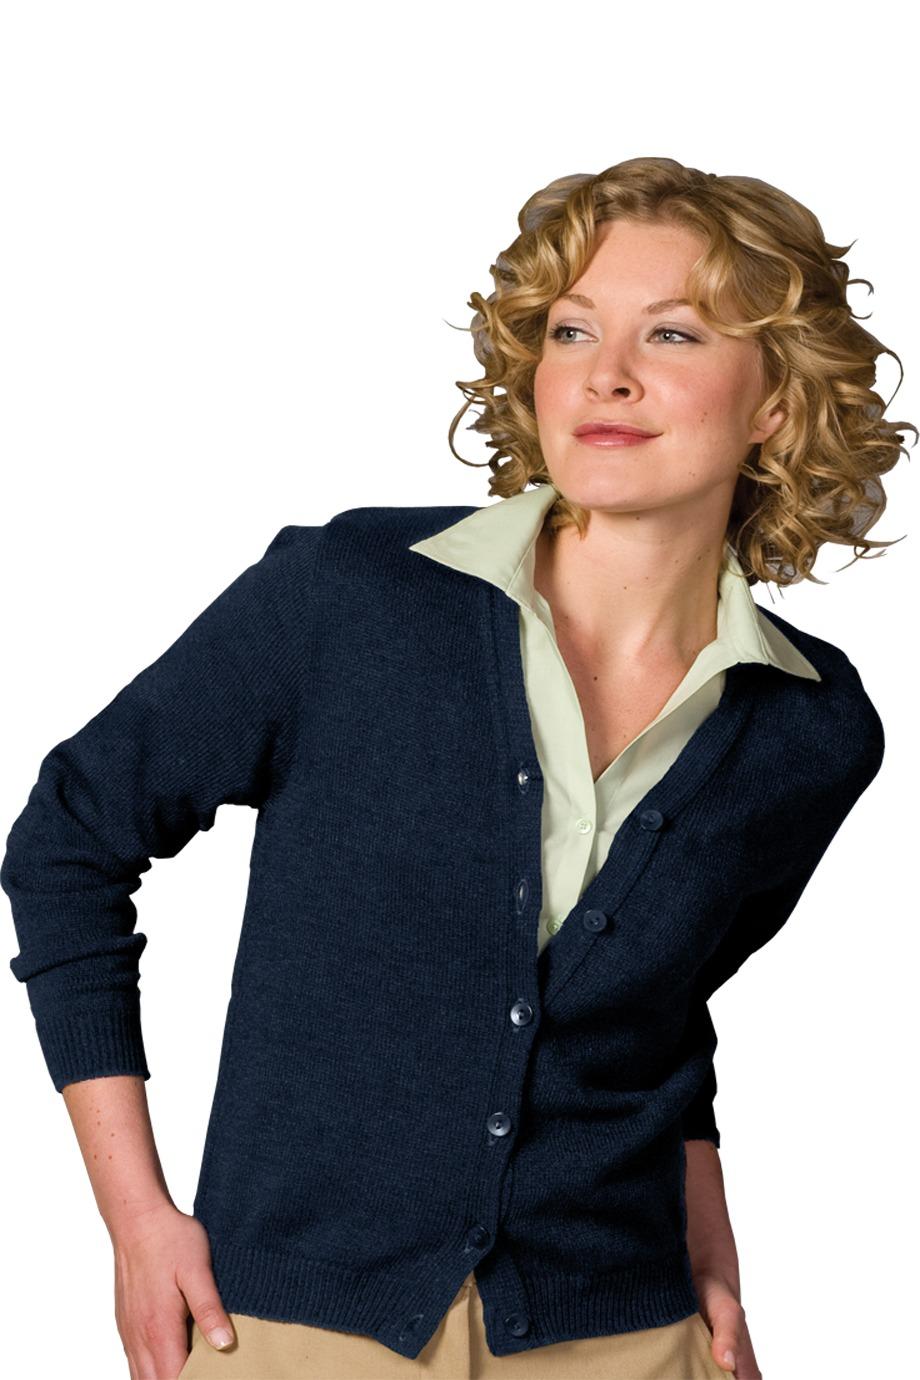 Edwards Garment 451 - Women's V-Neck Cardigan Vest